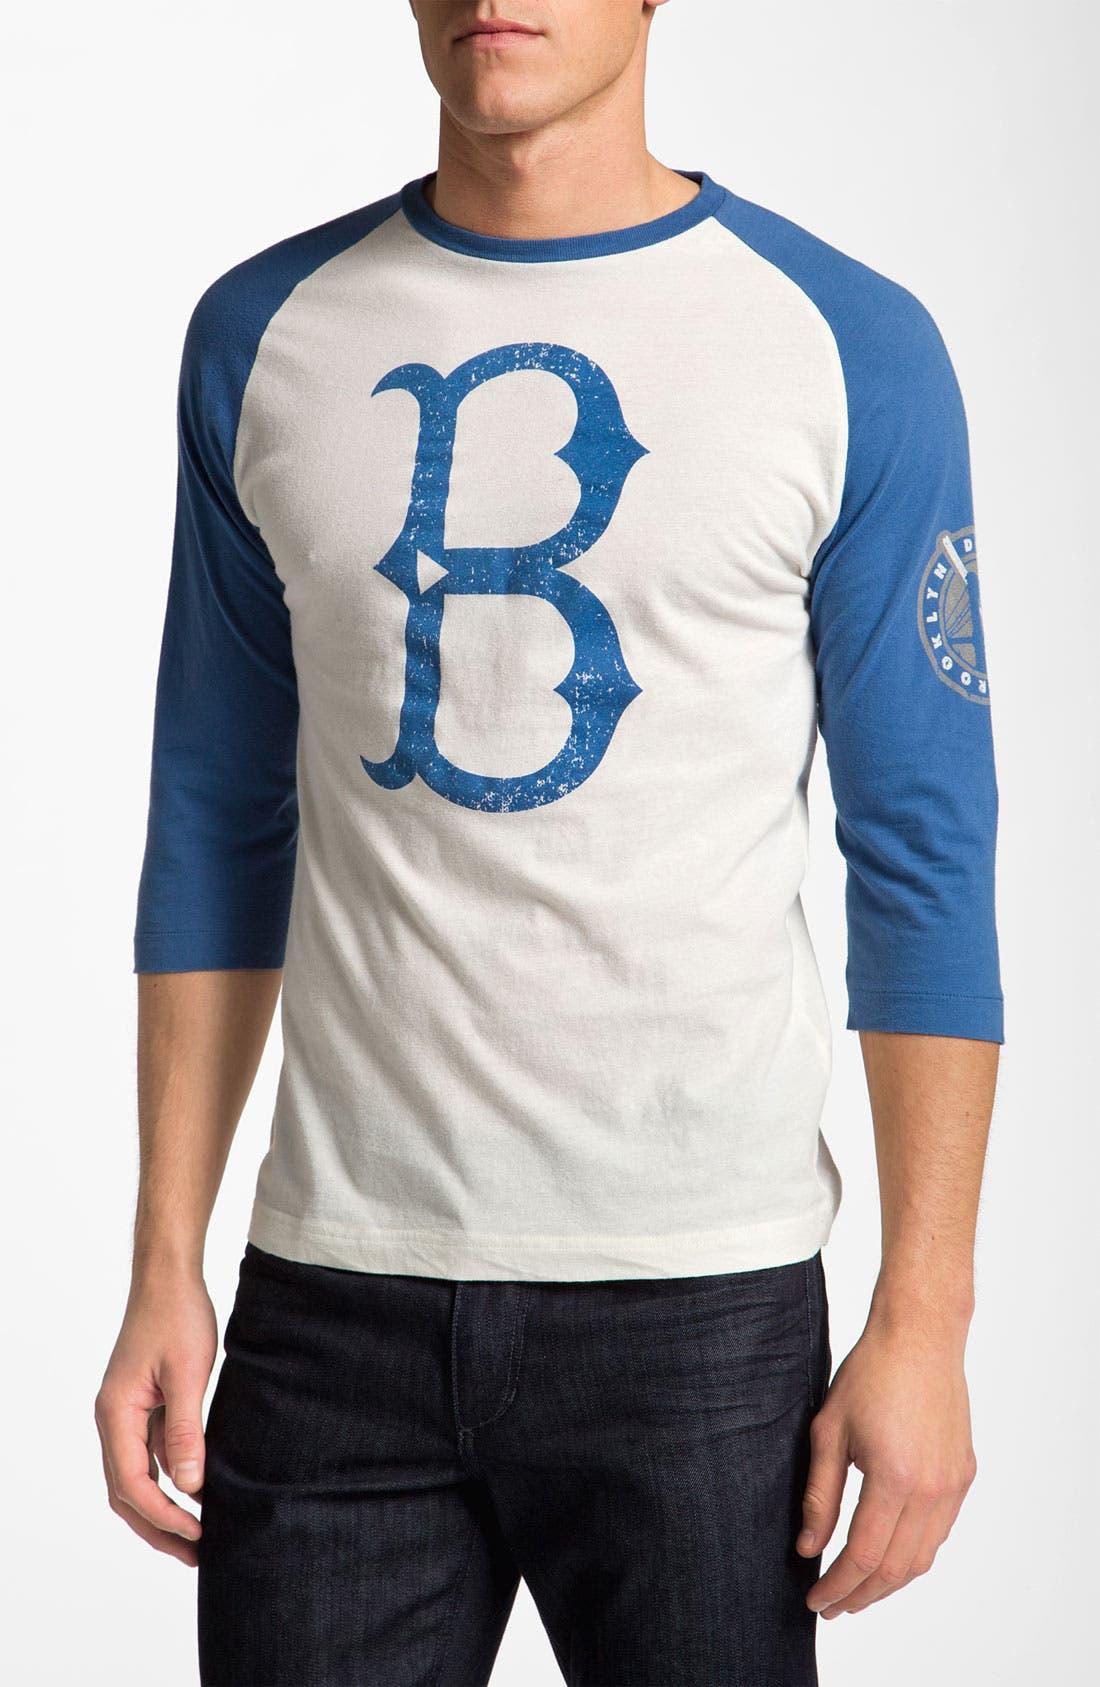 Alternate Image 1 Selected - Wright & Ditson 'Brooklyn Dodgers' Baseball T-Shirt